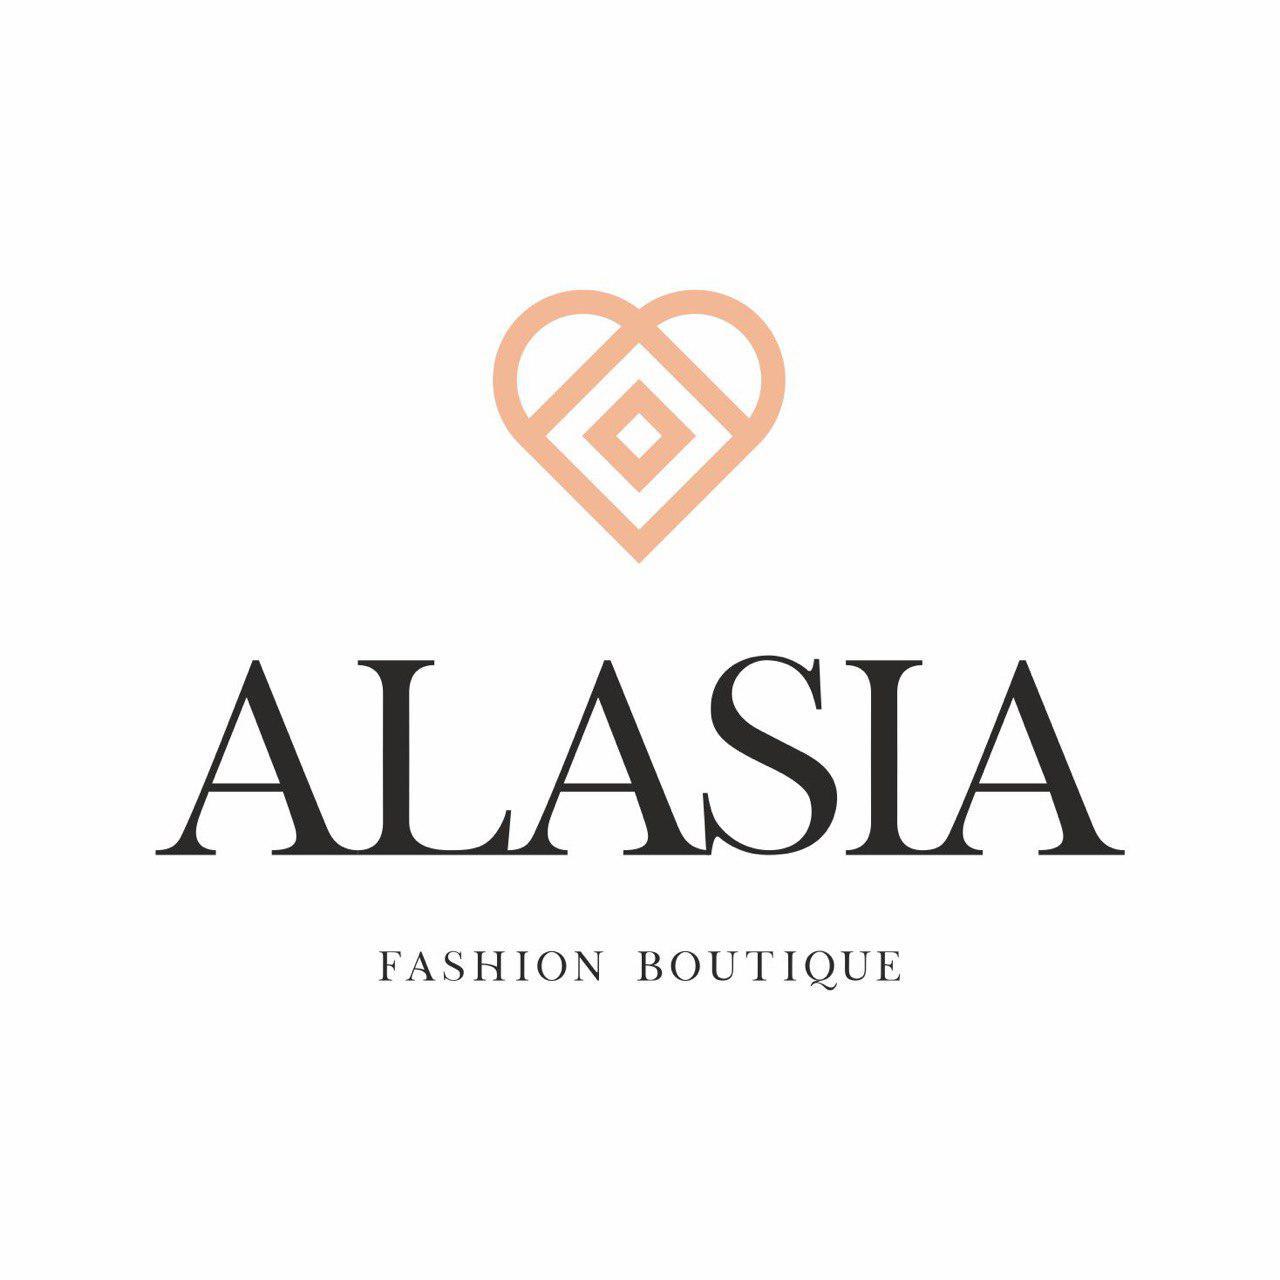 Alasia Fashion Boutique